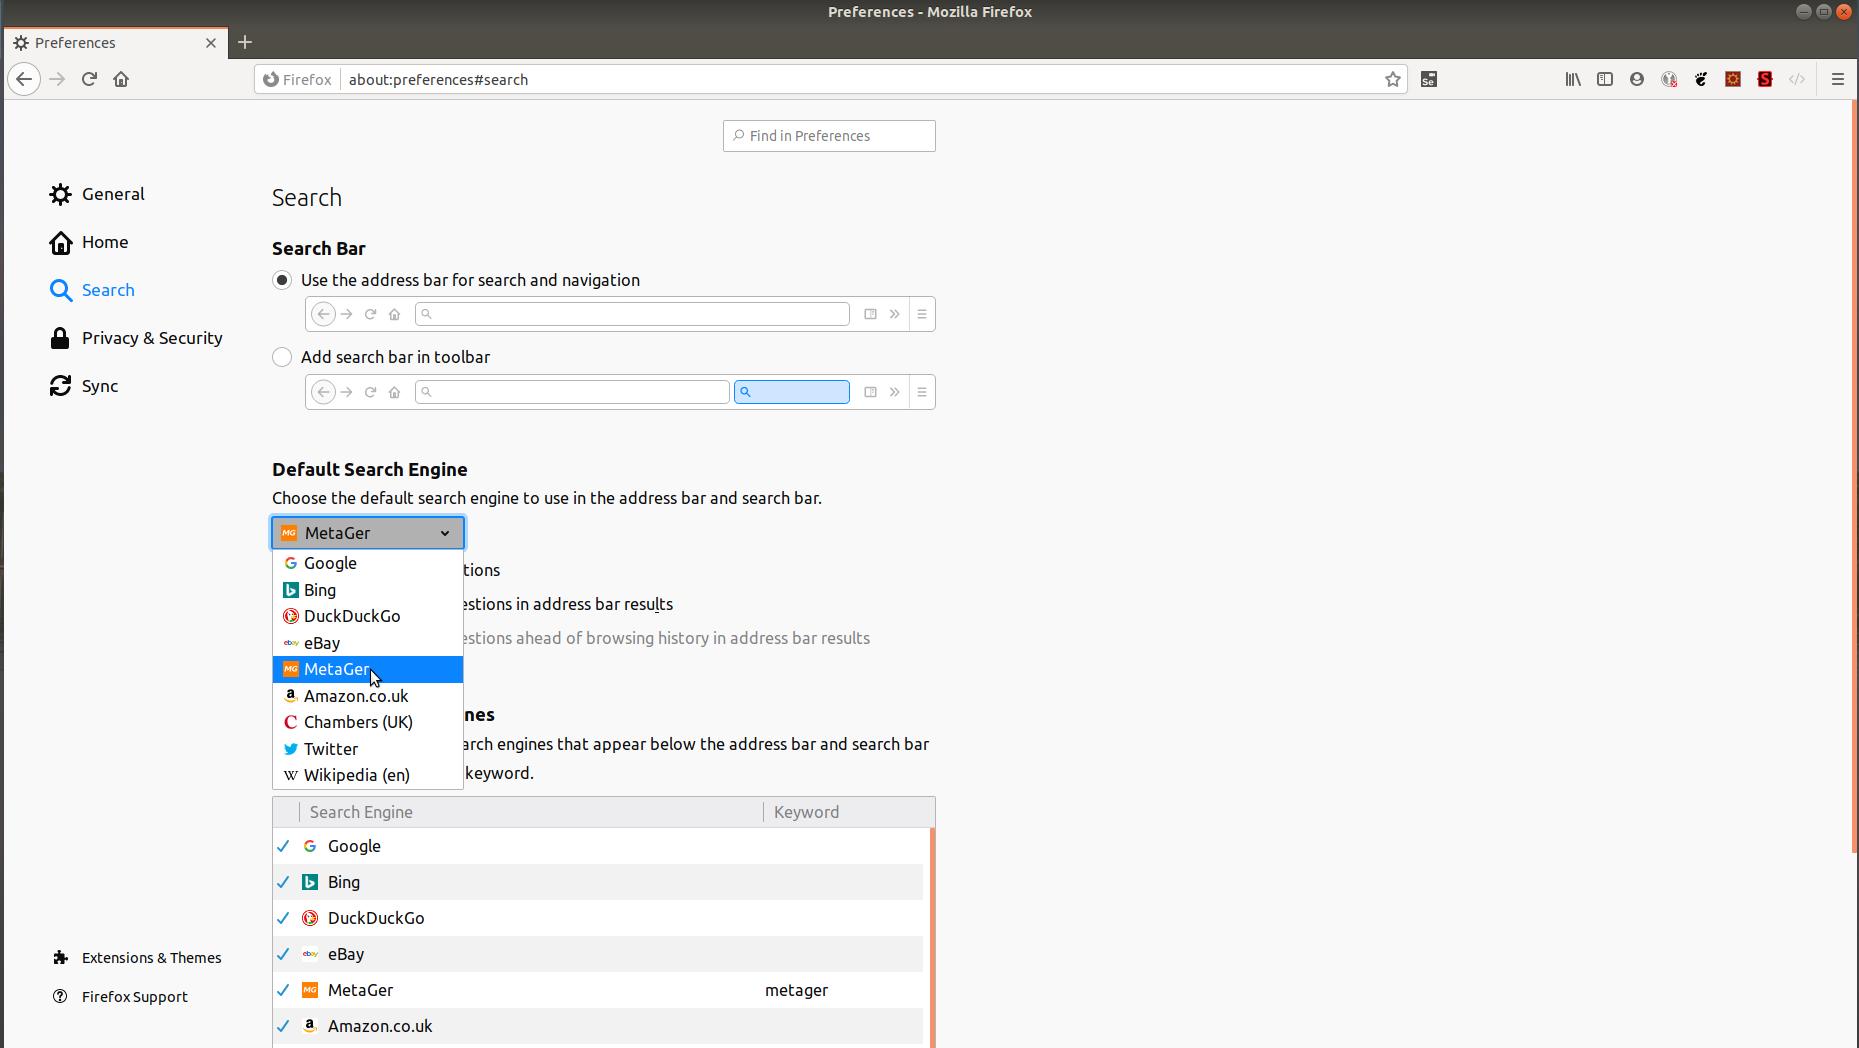 public/img/FirefoxEn_Standard.png